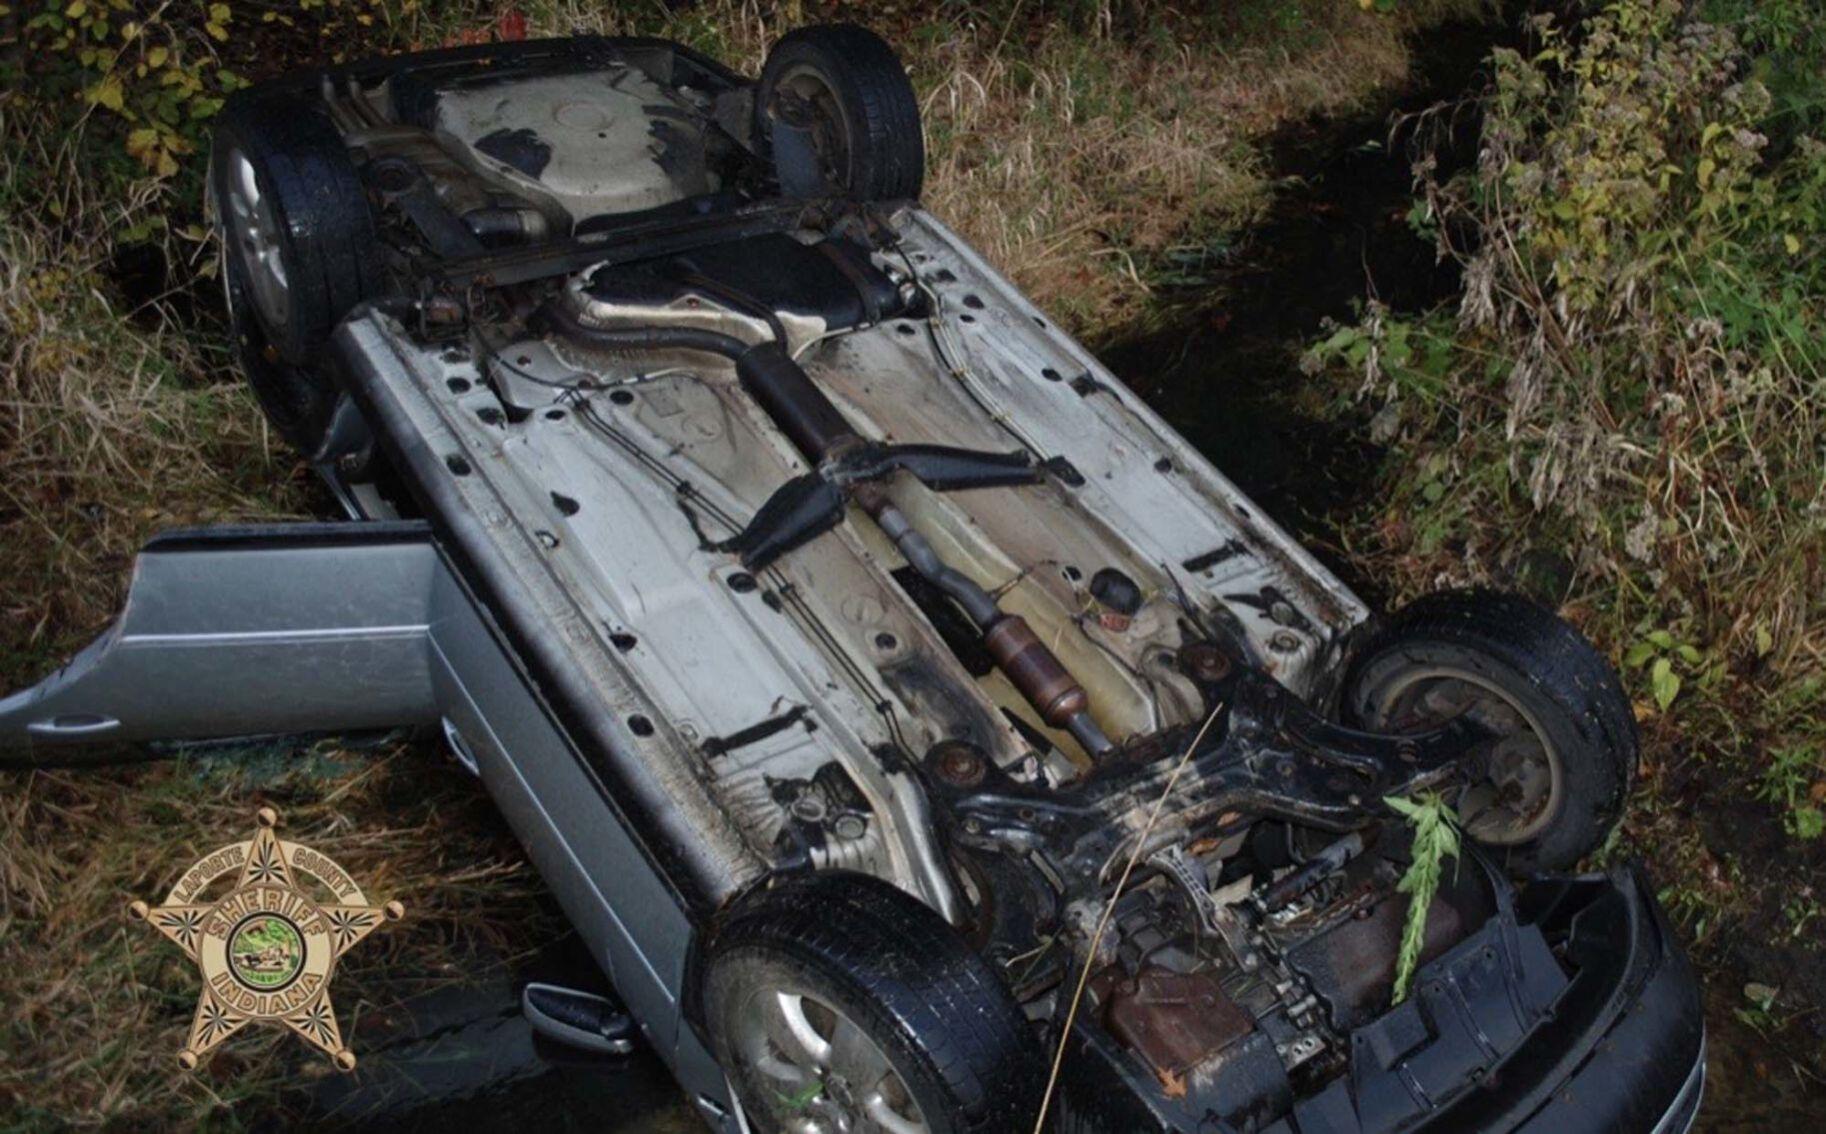 Michigan City man killed in rollover crash in Springfield Township